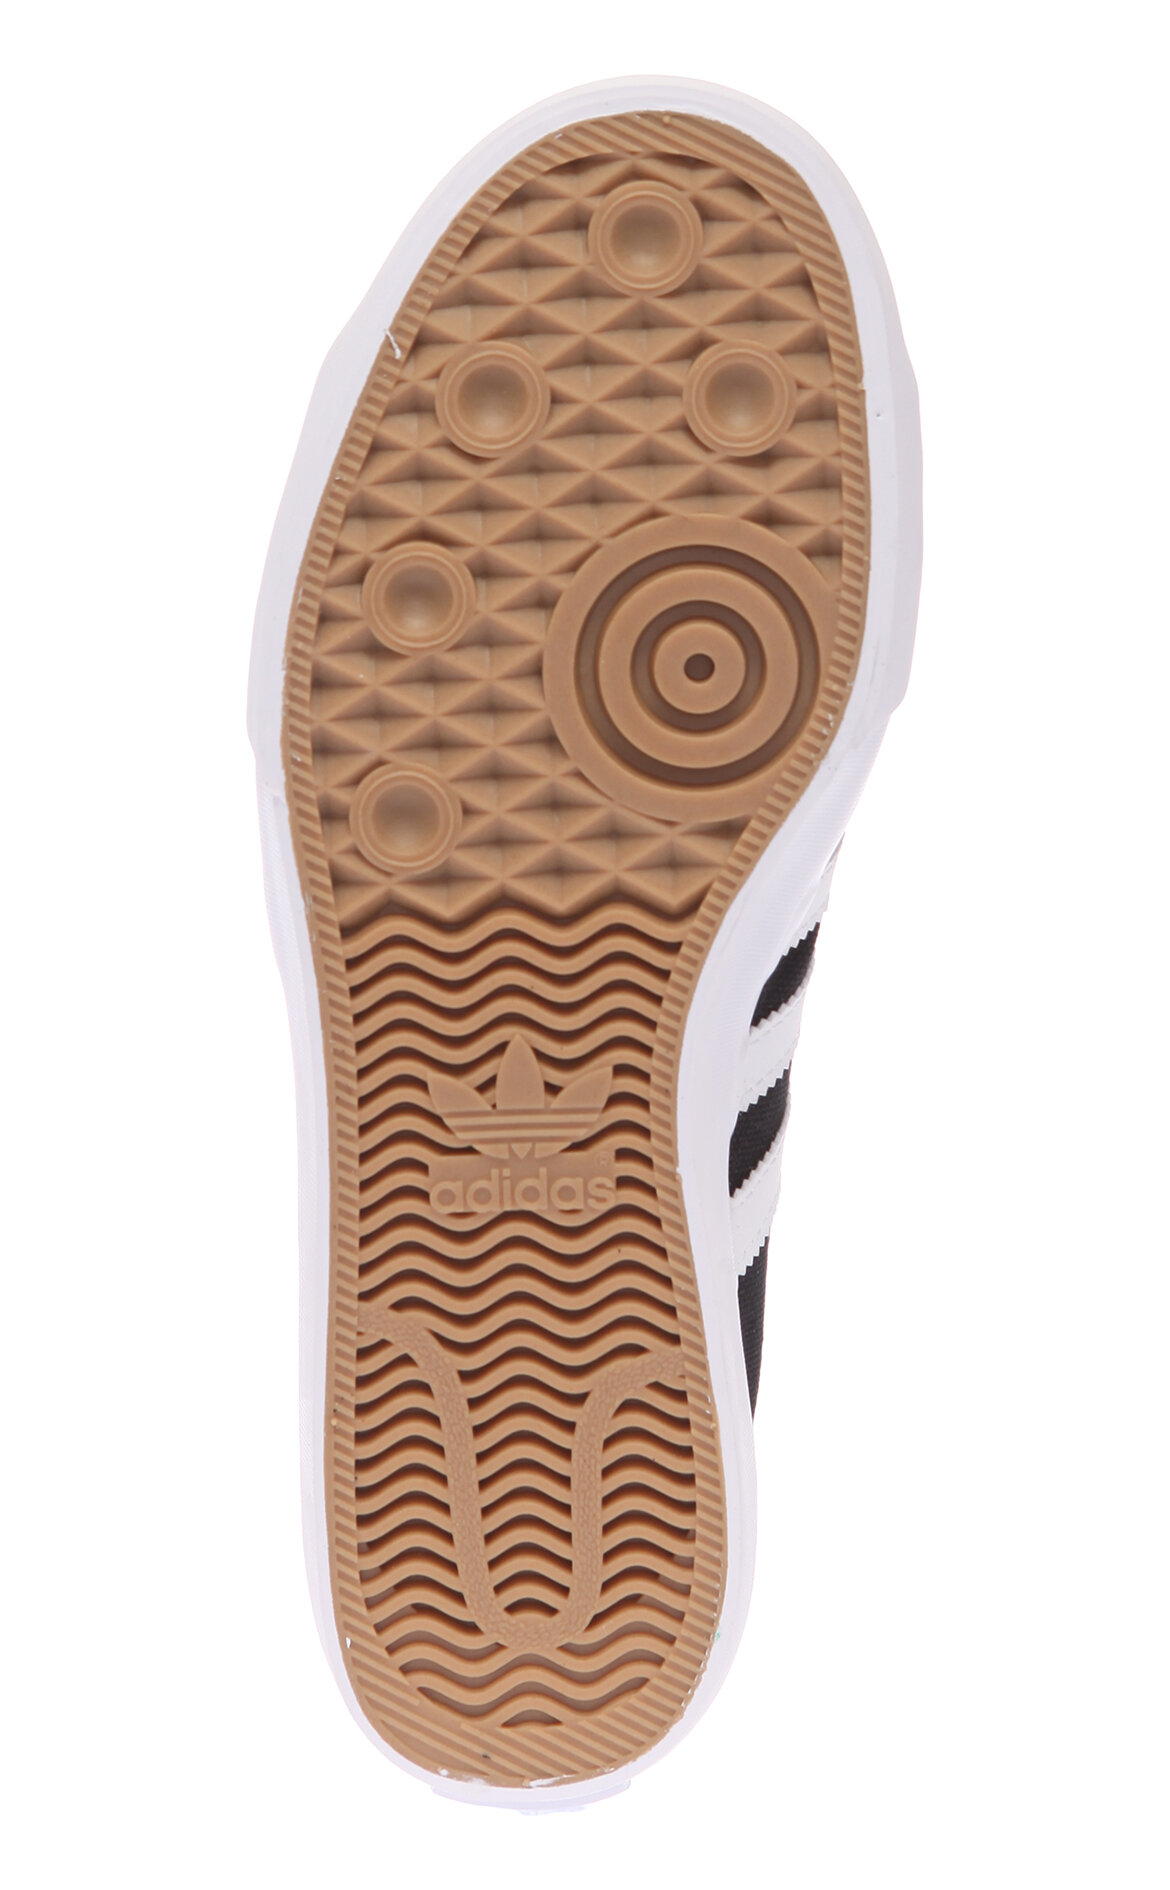 adidas originals Matchcourt Ayakkabı